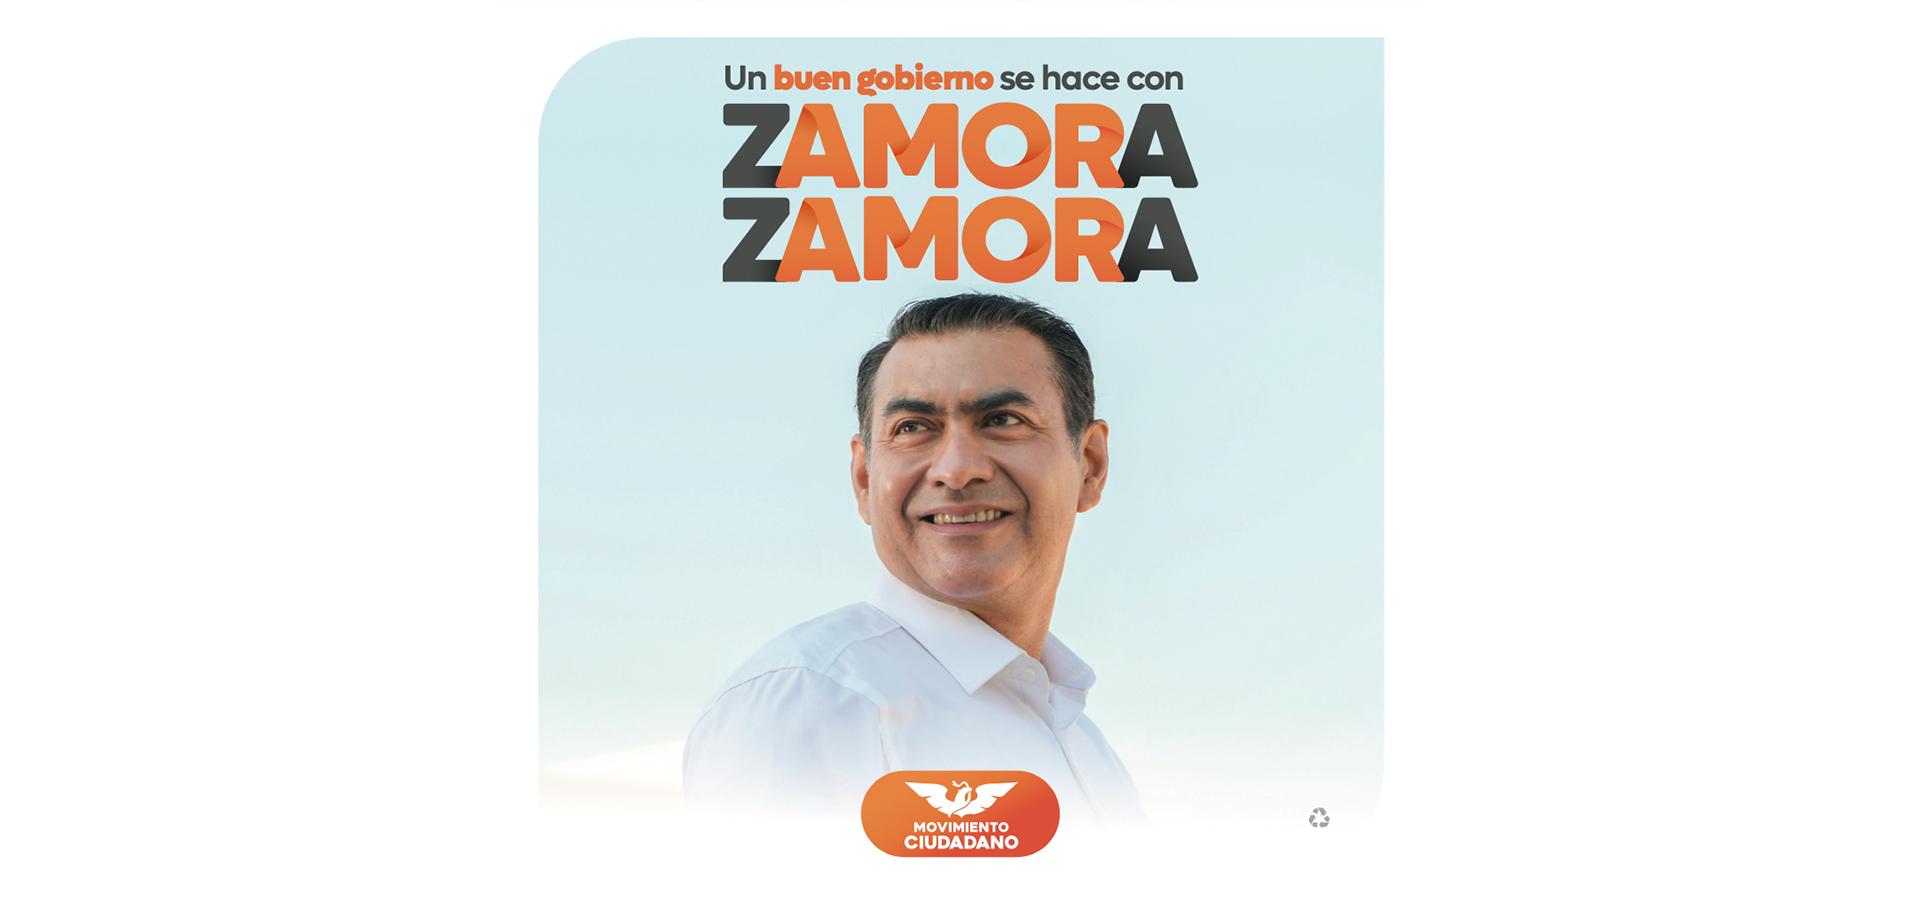 Un buen gobierno se hace con Zamora Zamora